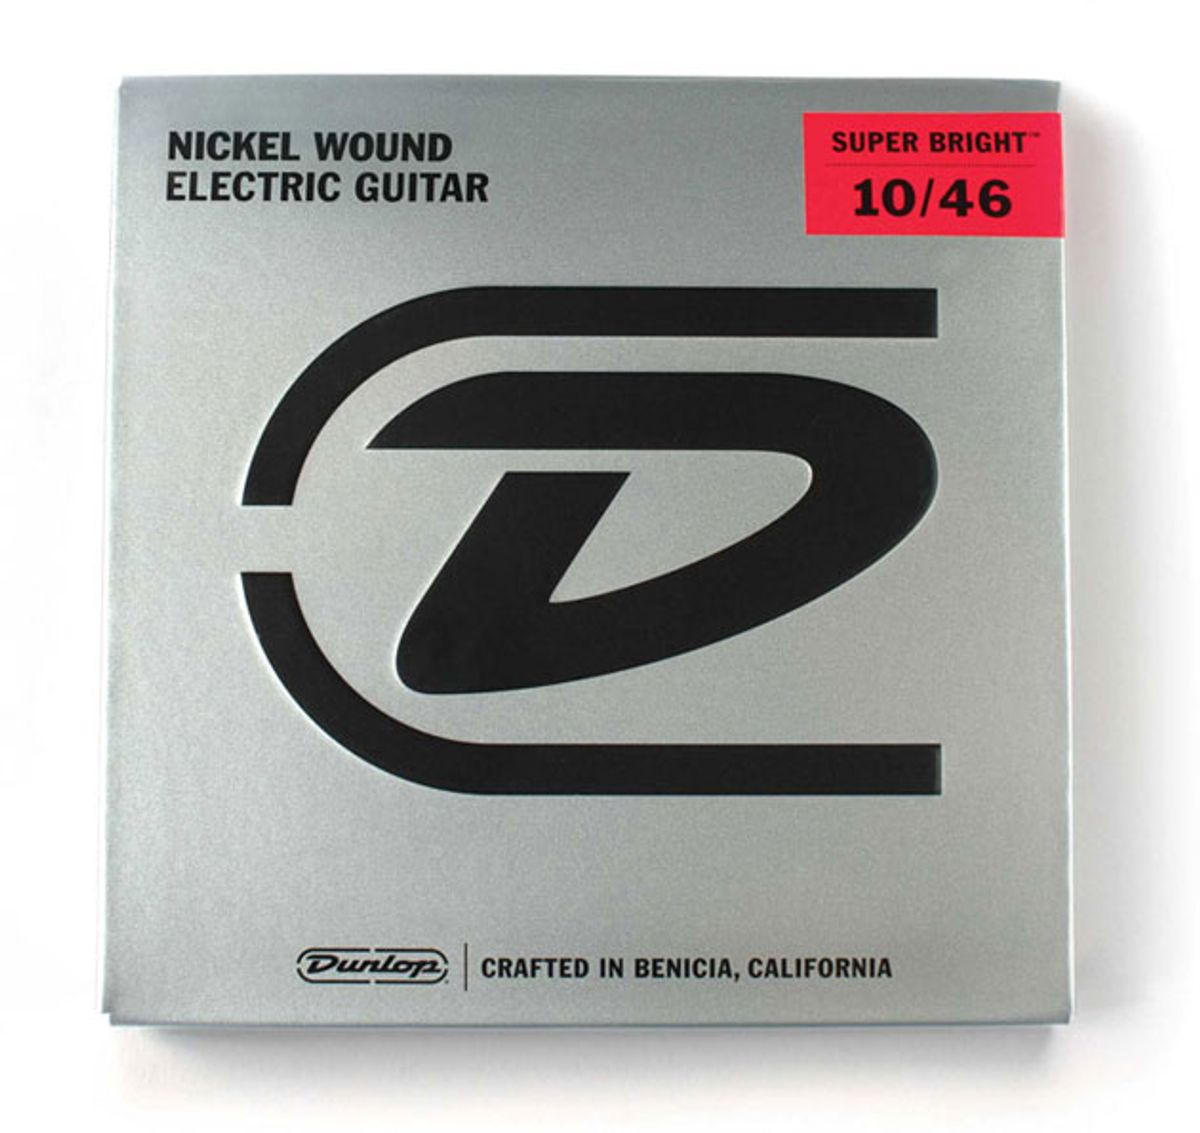 Dunlop Announces Super Bright Guitar Strings